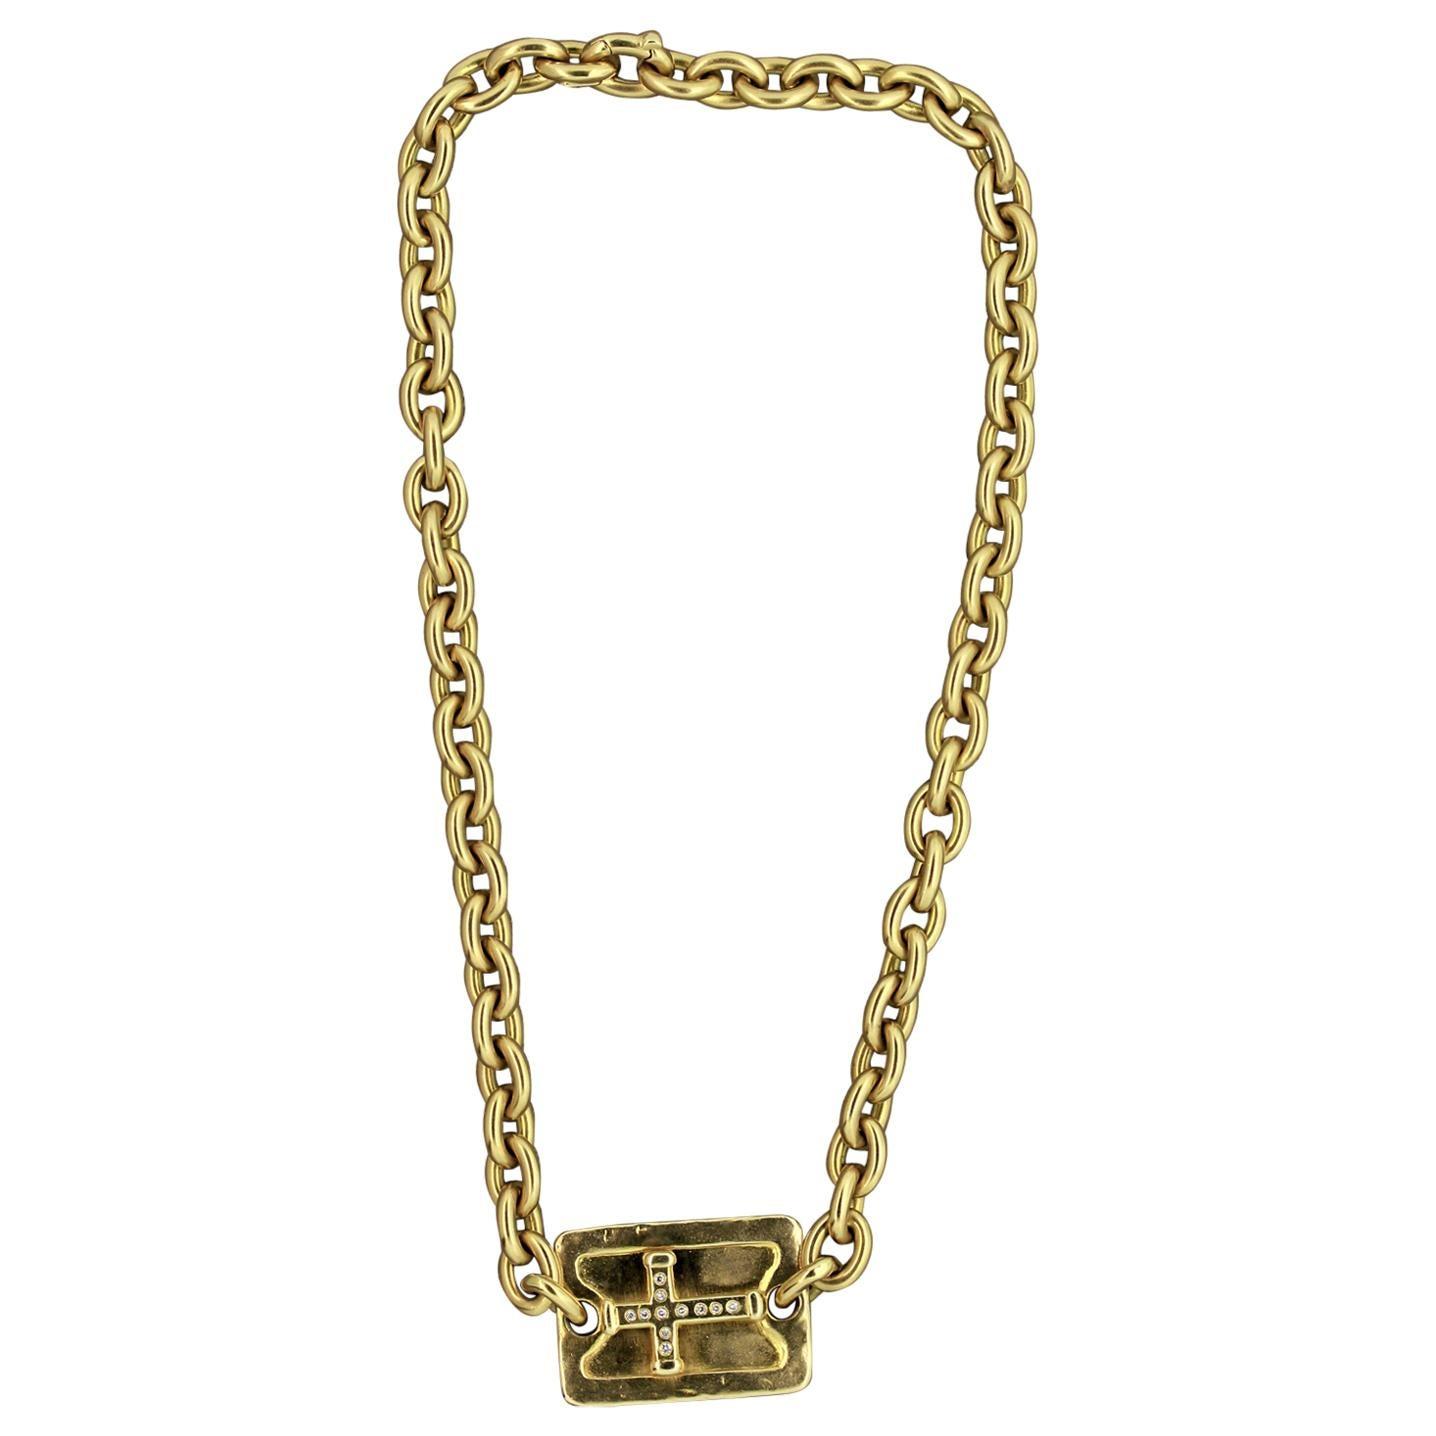 Gold Diamond Cross Chain Necklace